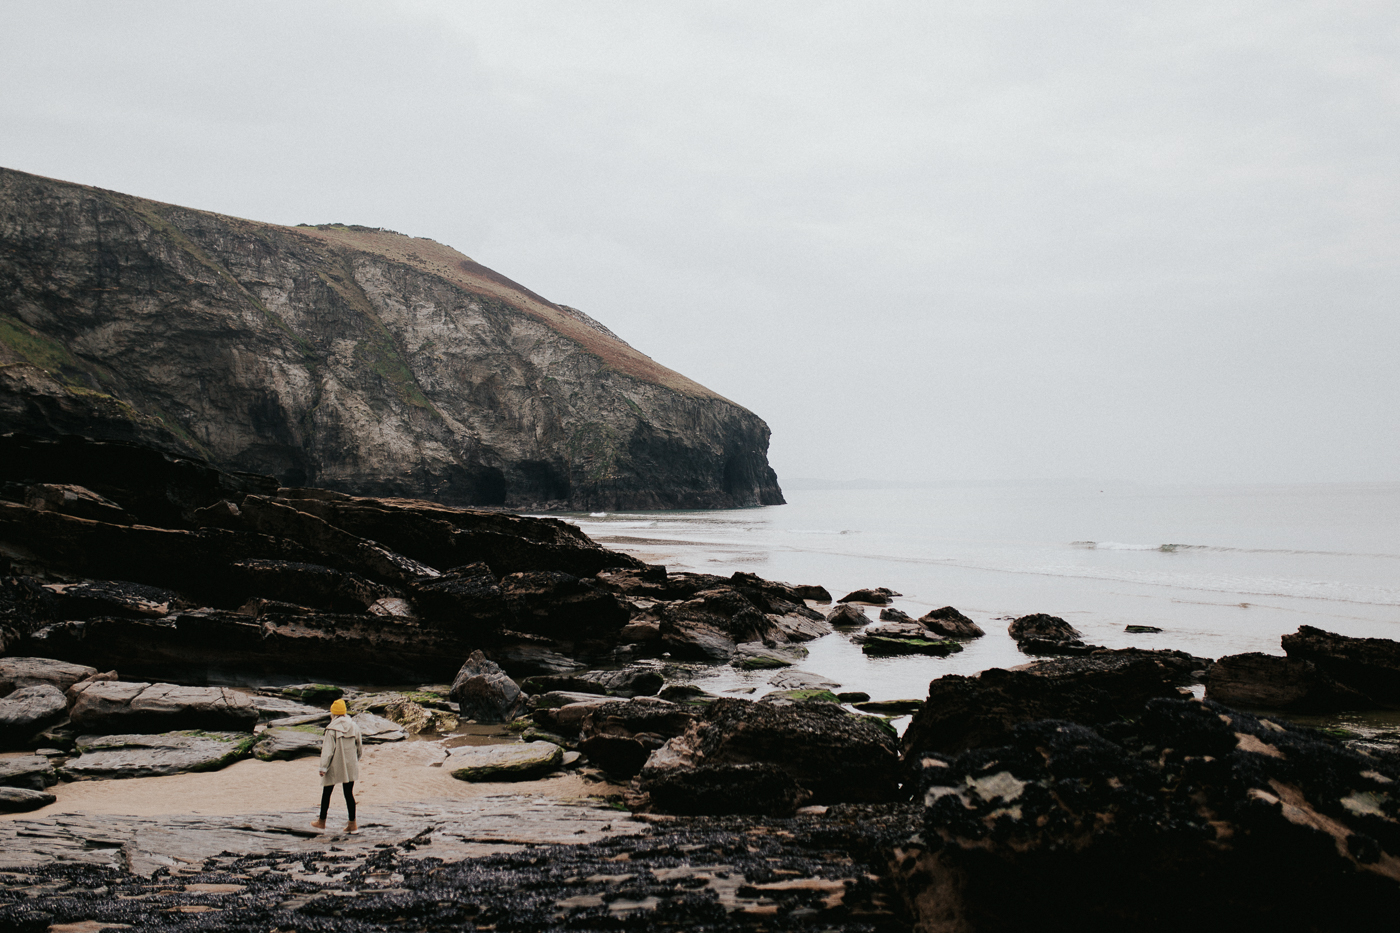 Superfex_Kudhva_Cornwall_Cabin_Adventure_41.jpg